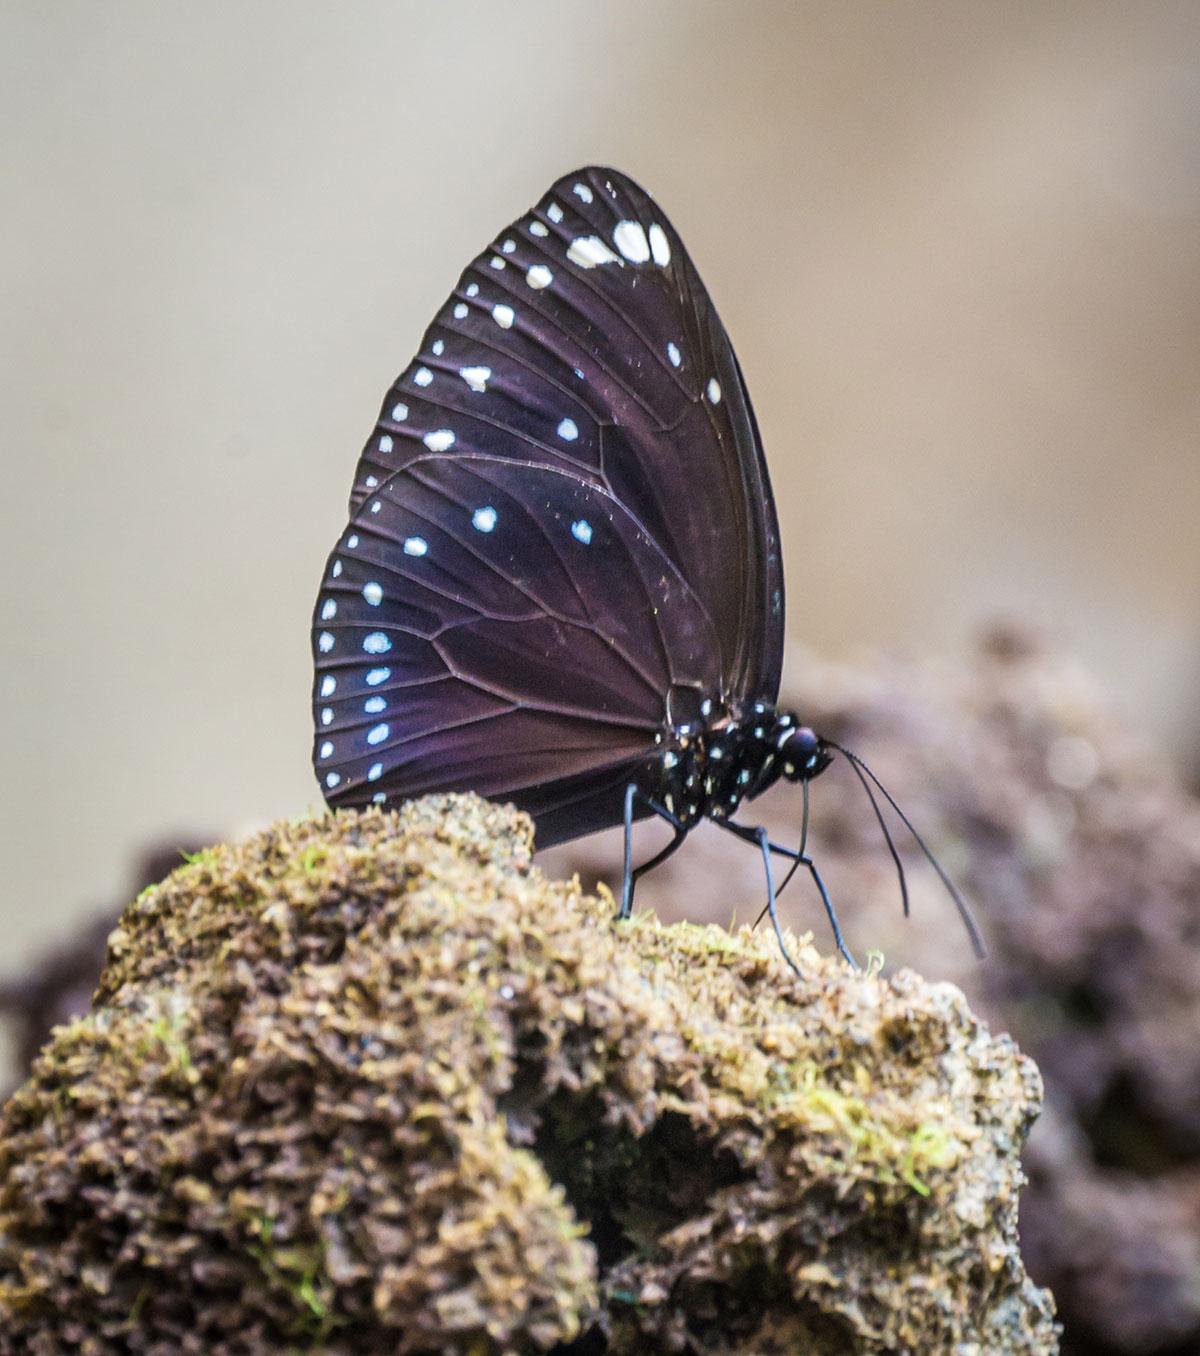 Butterfly, Bunaken Island, Manado, Indonesia